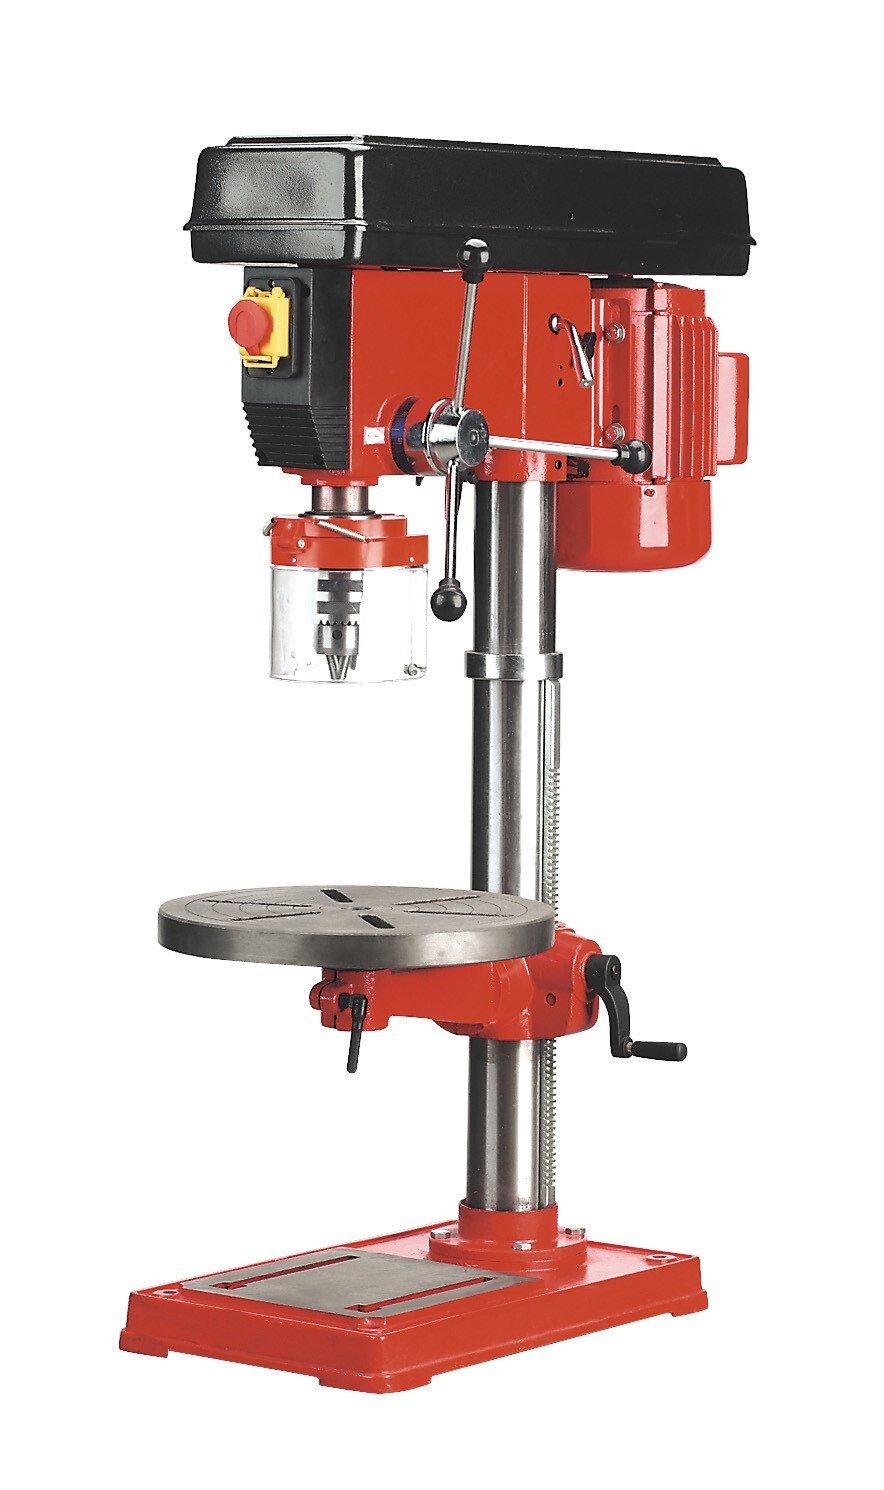 Sealey GDM180B Pillar Drill Bench 16-Speed 1085mm Height 925W/230V